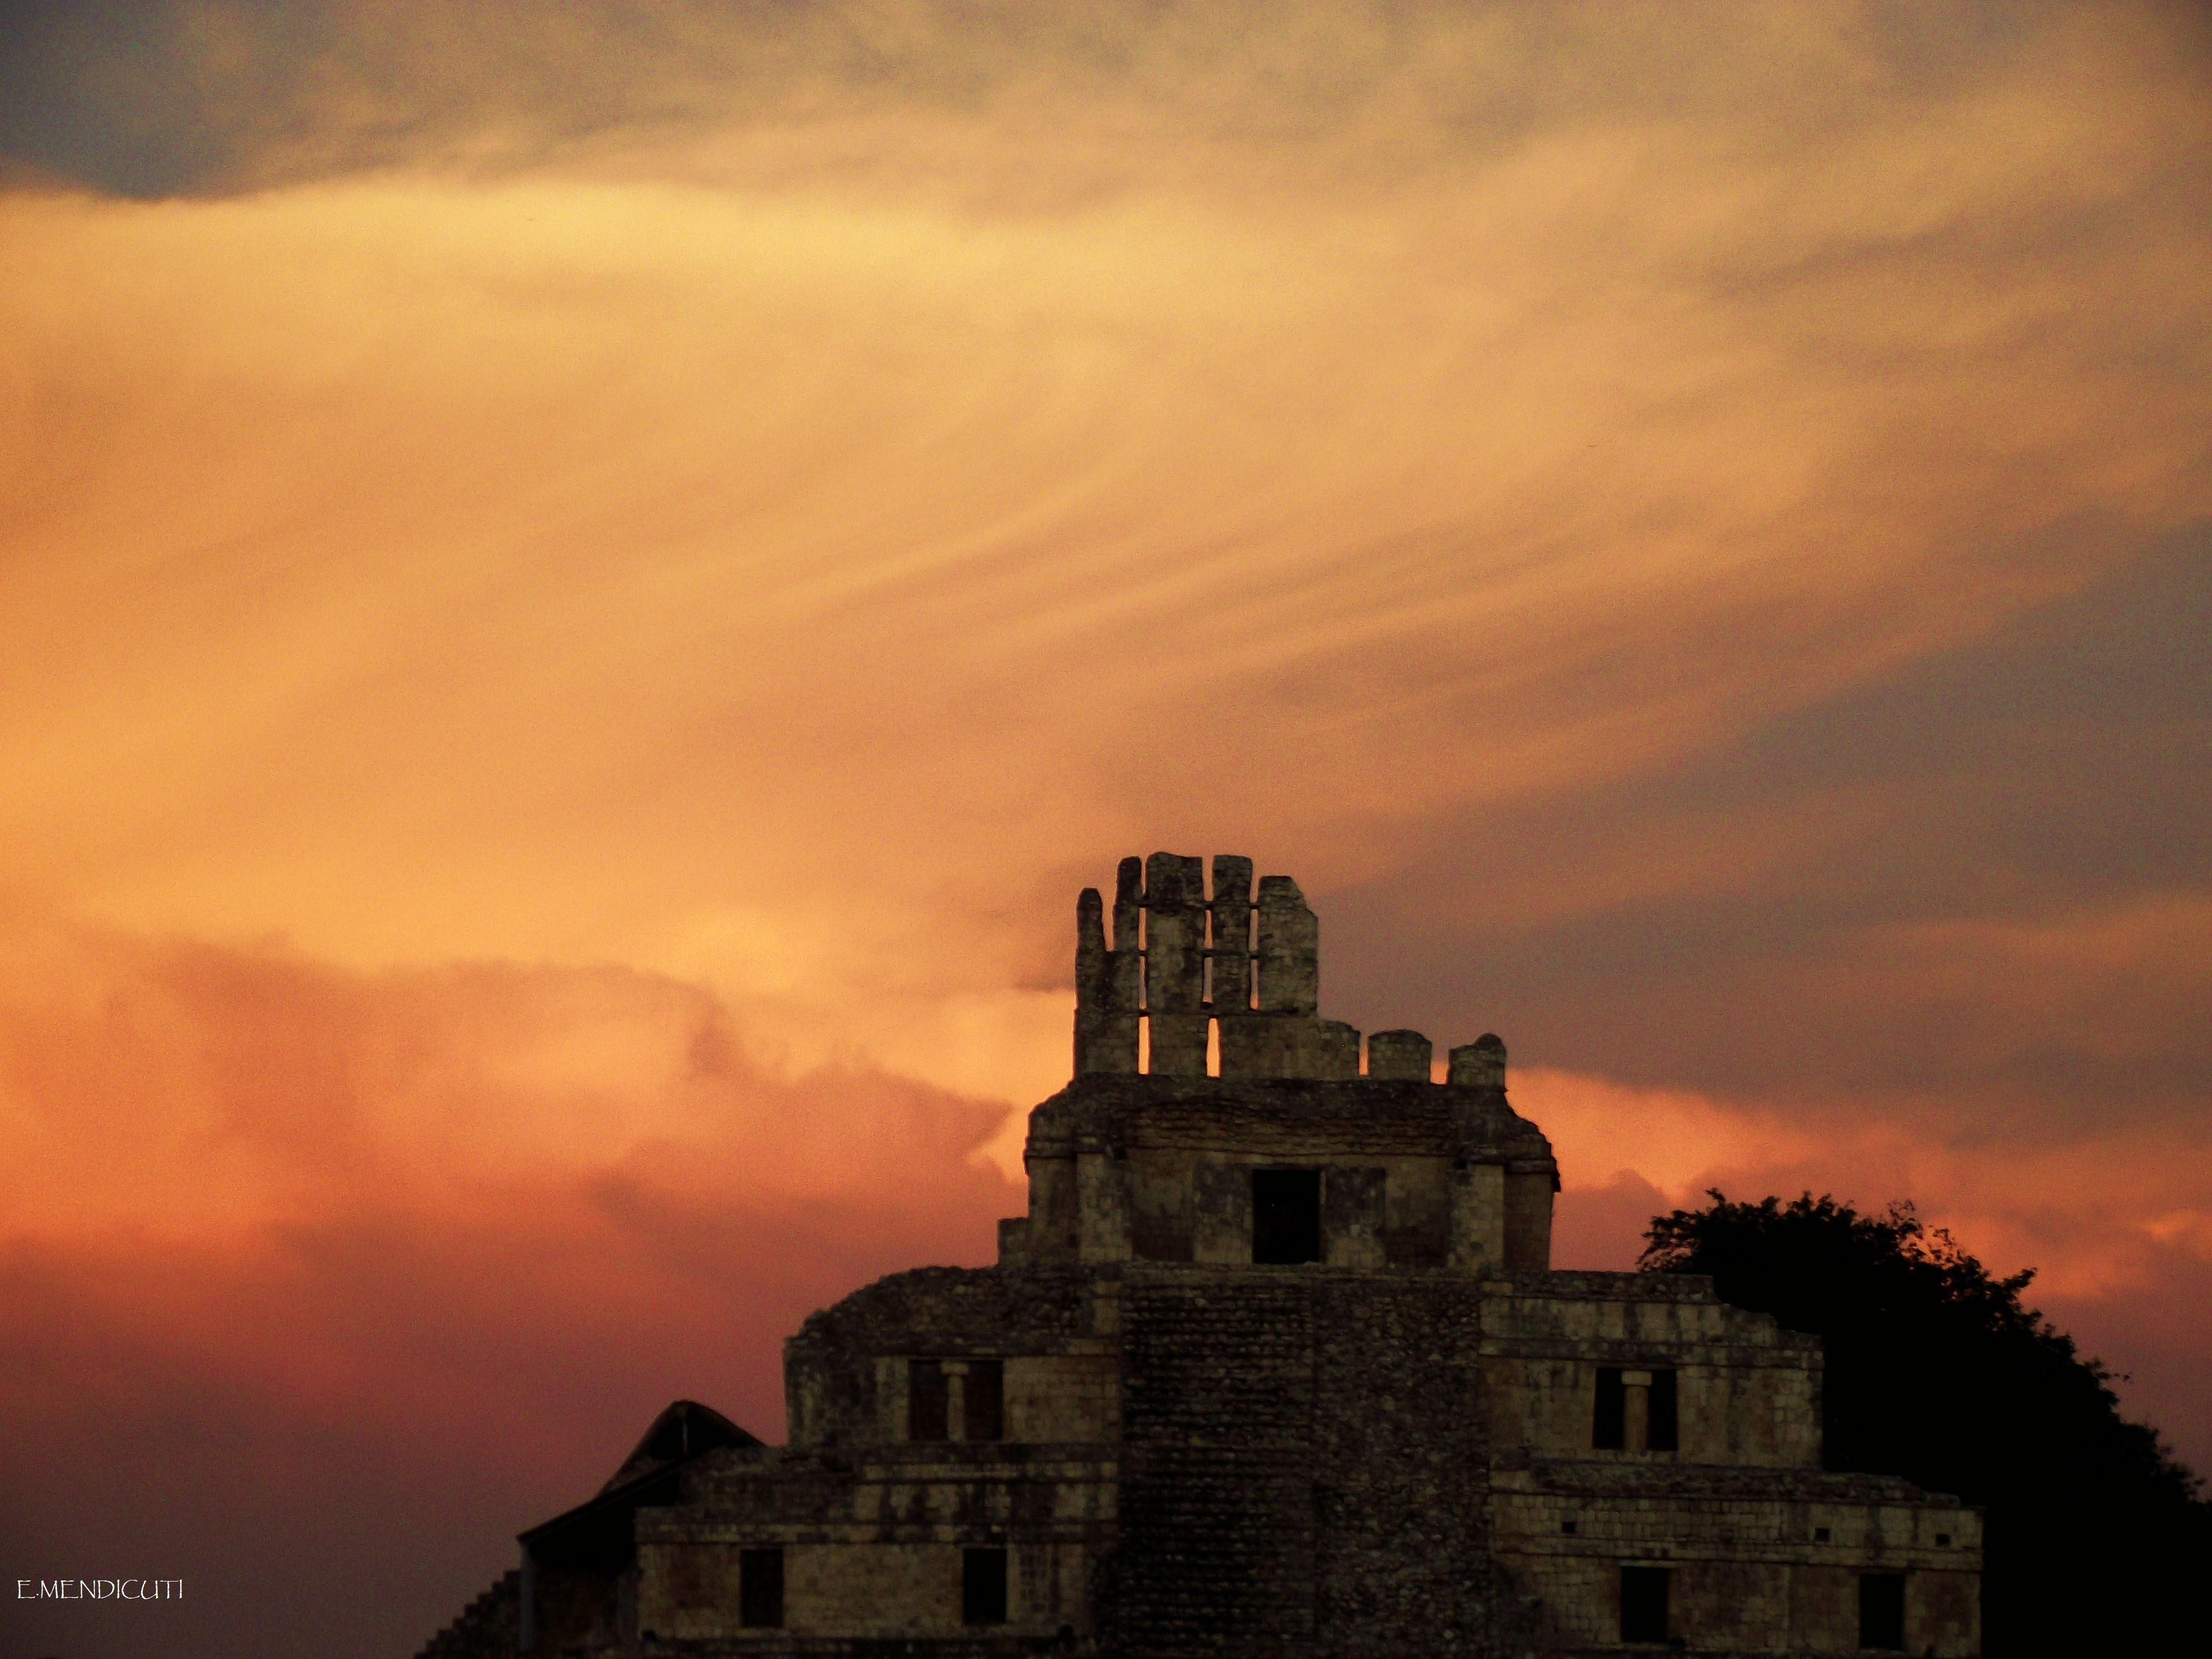 Edzna Campeche Mexico   Campeche City Monuments